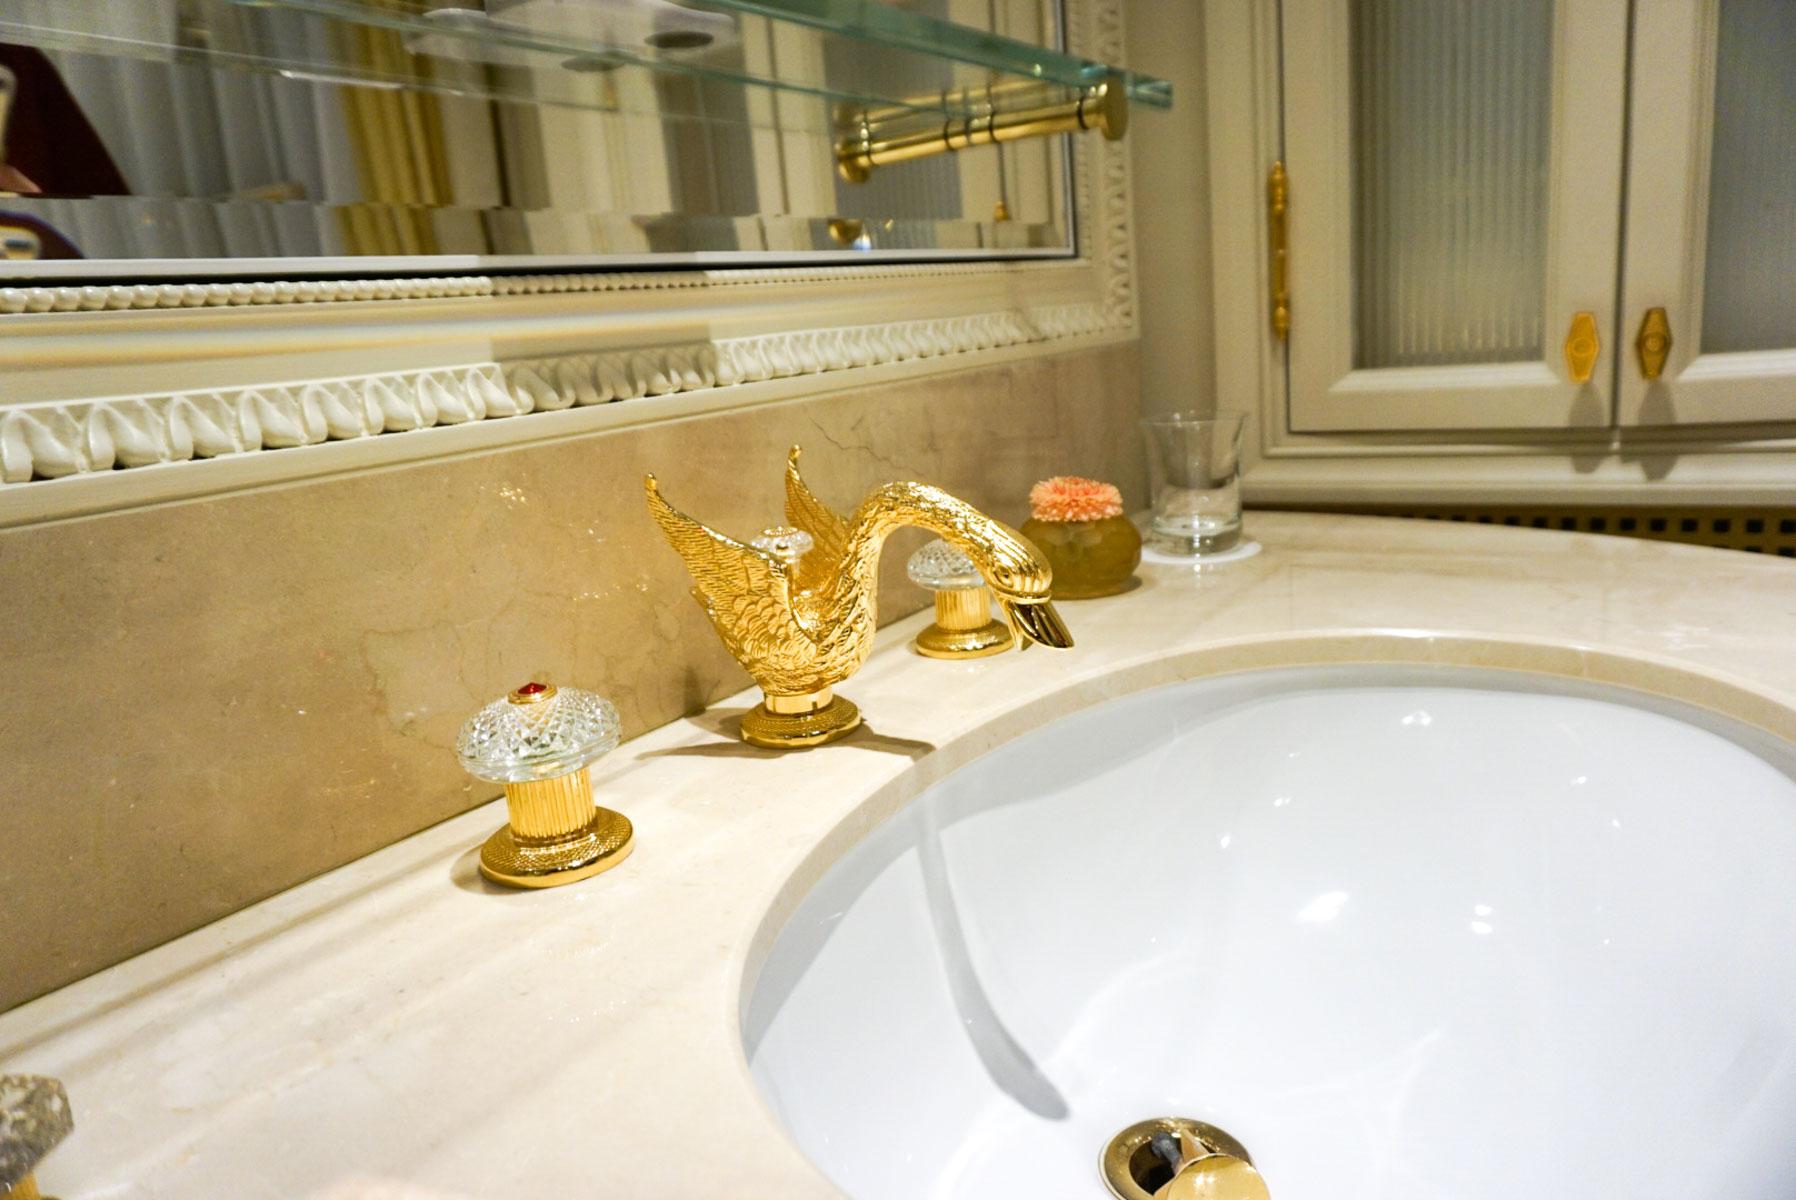 Hotel_Ritz_Paris_Trip_to_Paris-2565.jpg